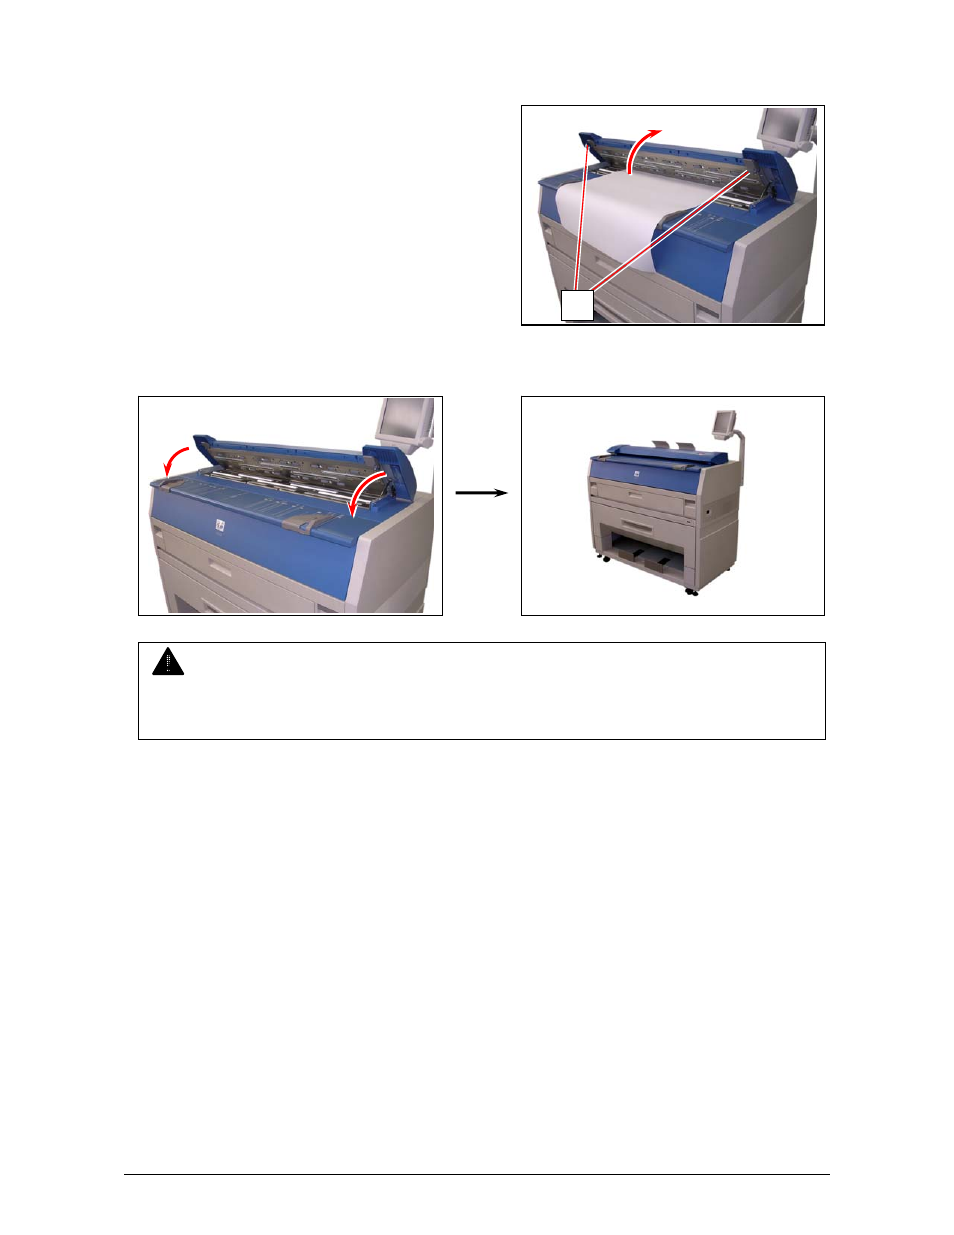 konica minolta kip 3100 user manual page 47 56 rh manualsdir com